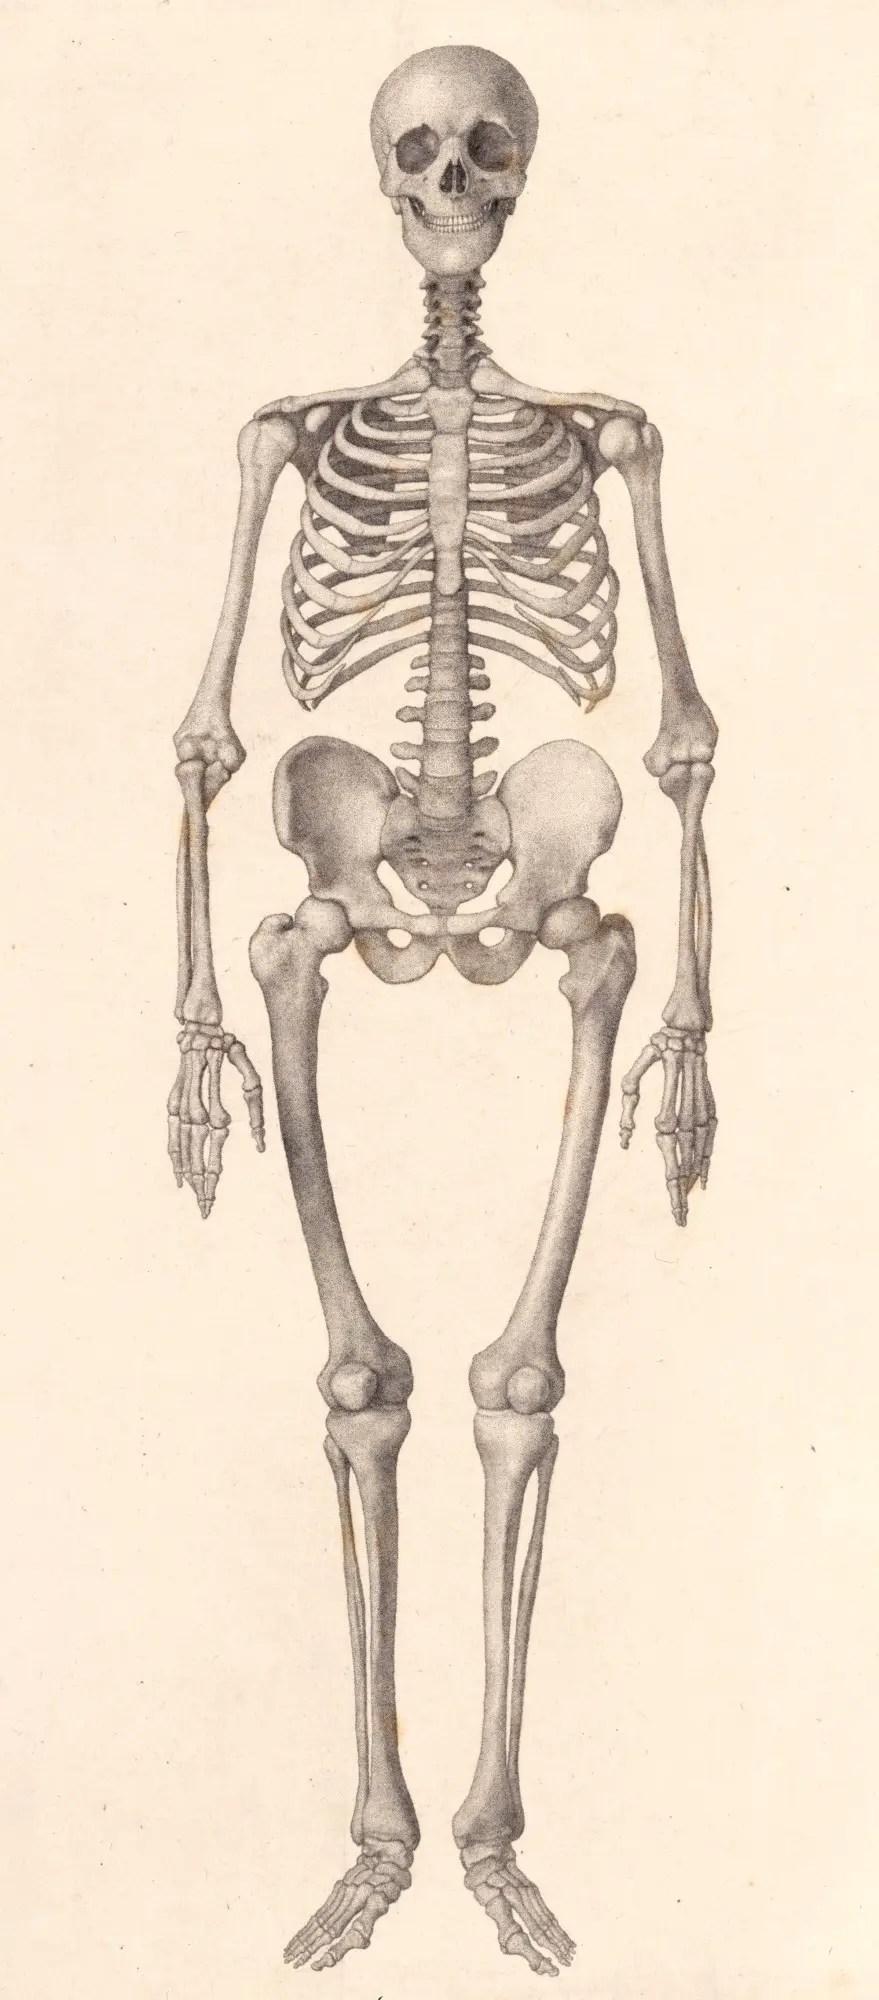 medium resolution of george stubbs ara human skeleton frontal view